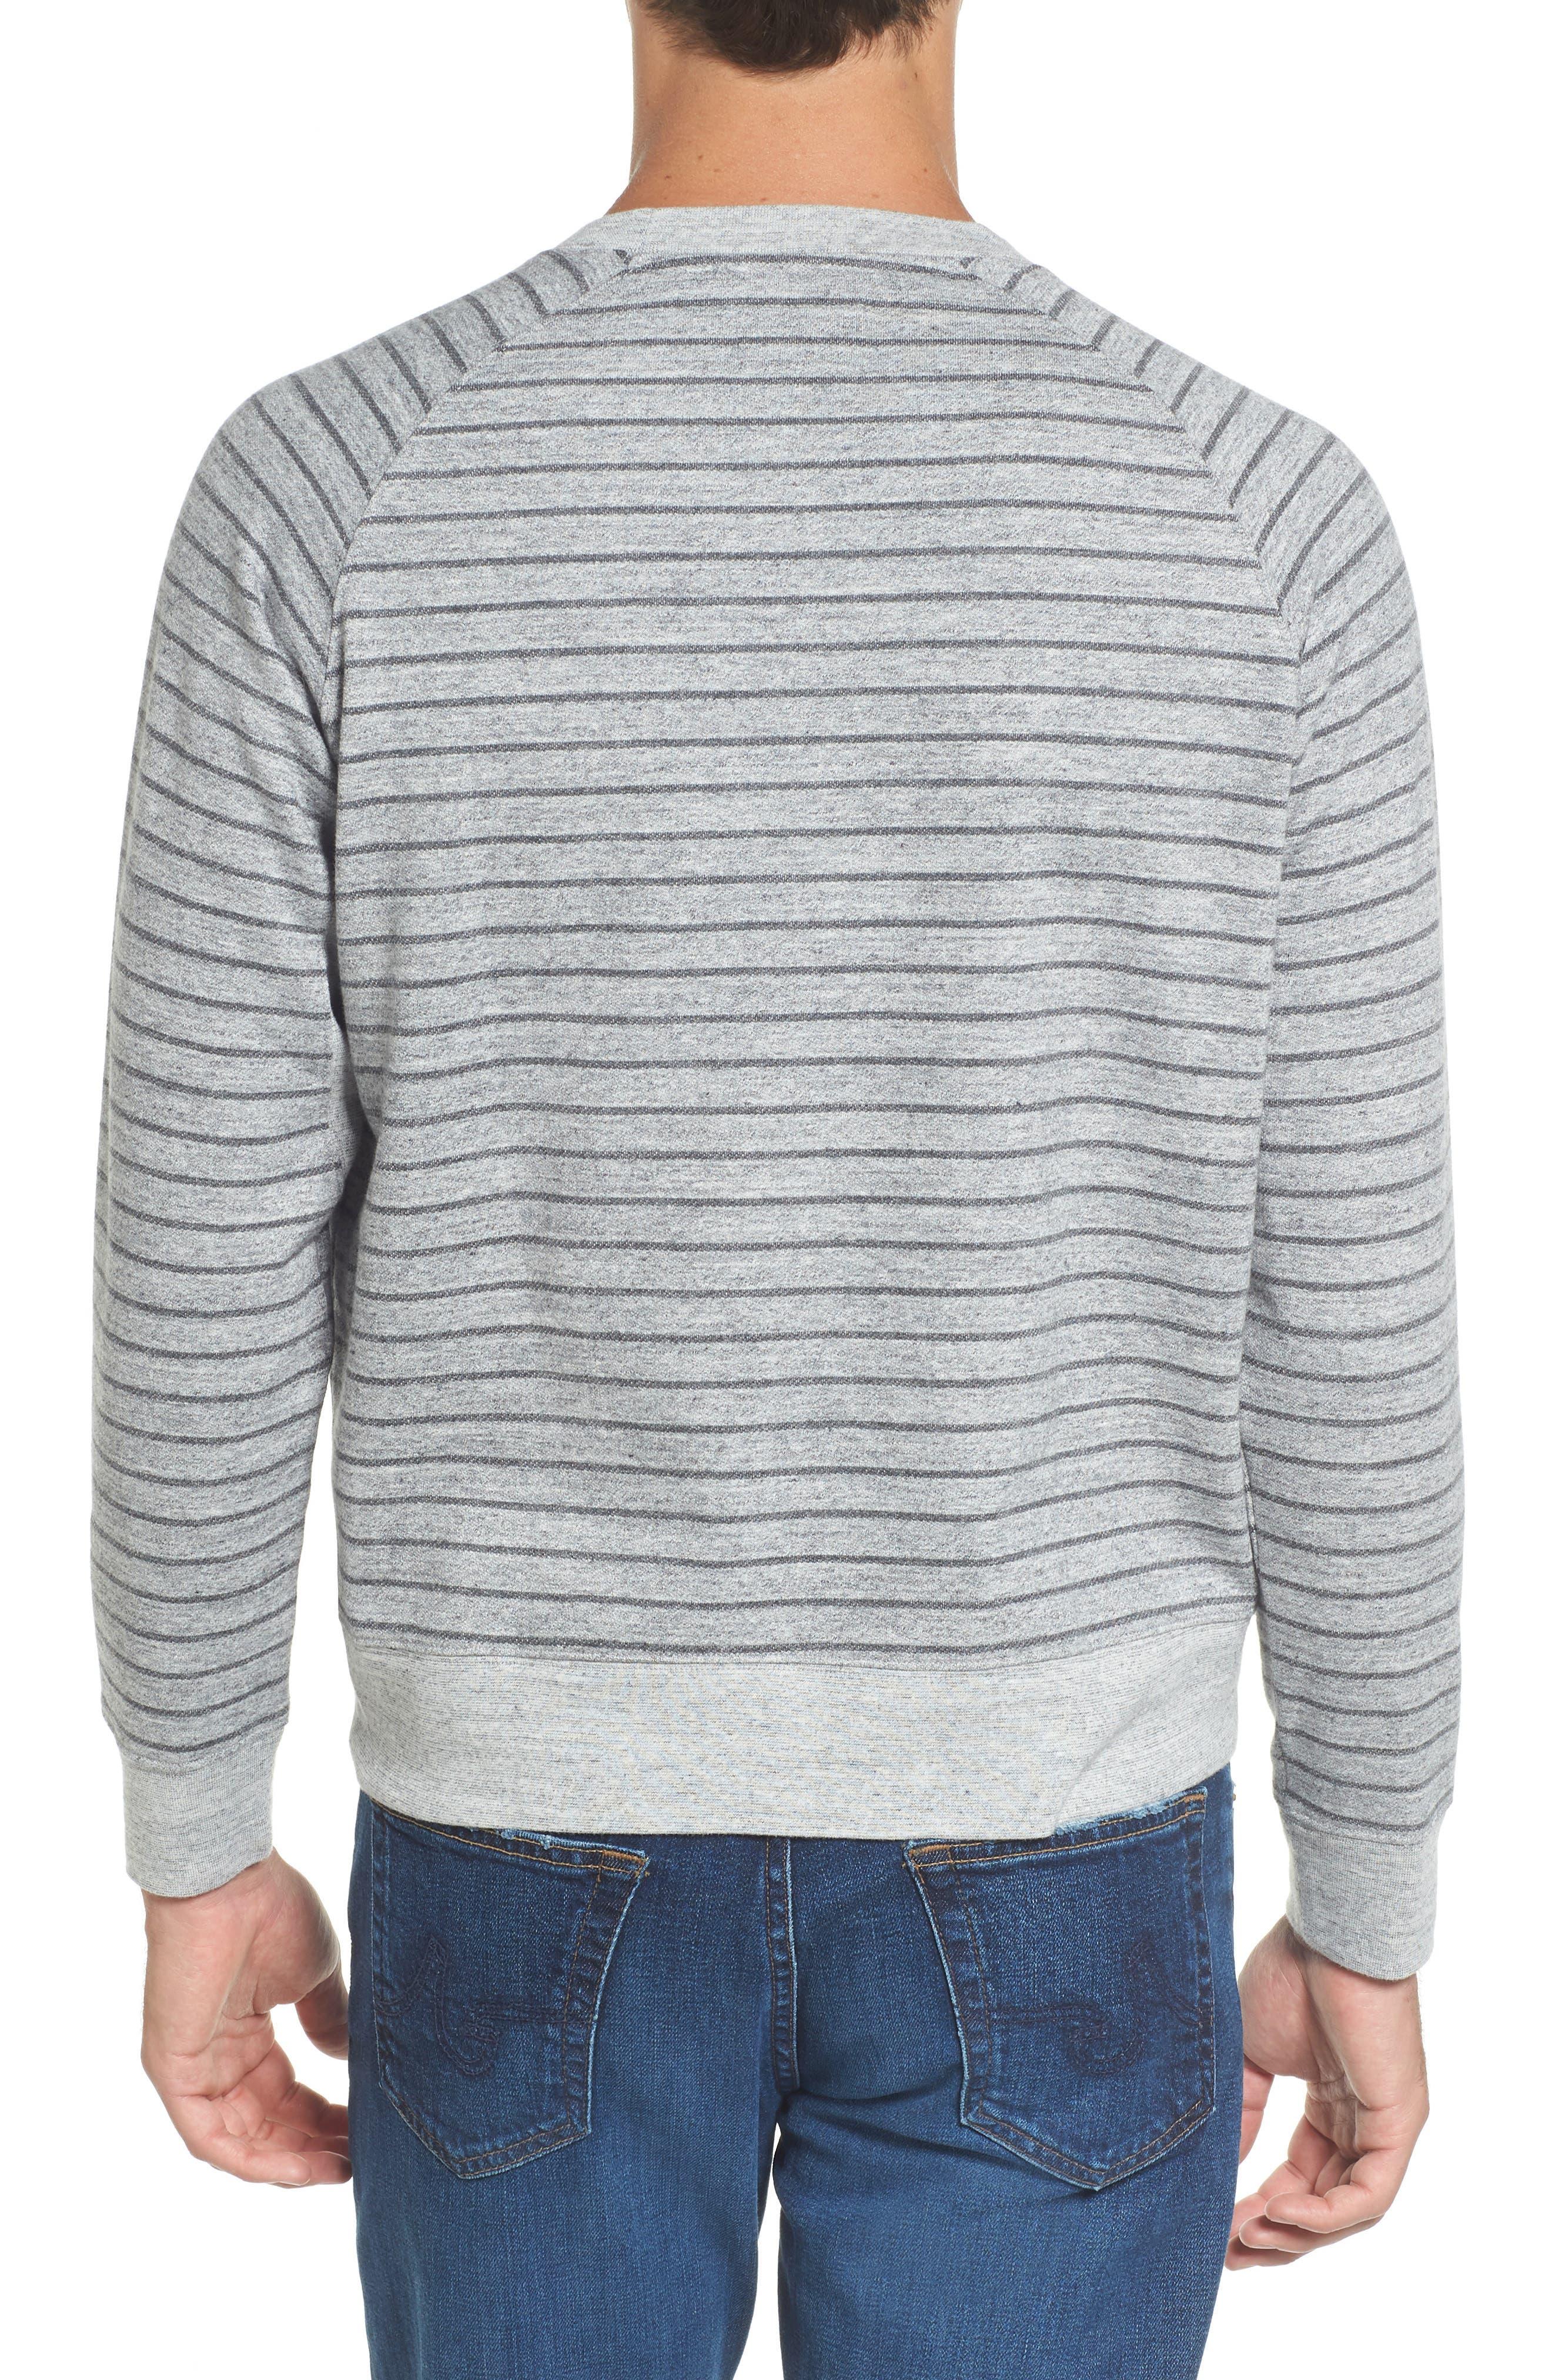 Palmer Modern Fit Athletic Stripe Sweatshirt,                             Alternate thumbnail 4, color,                             Gray Heather / Charcoal